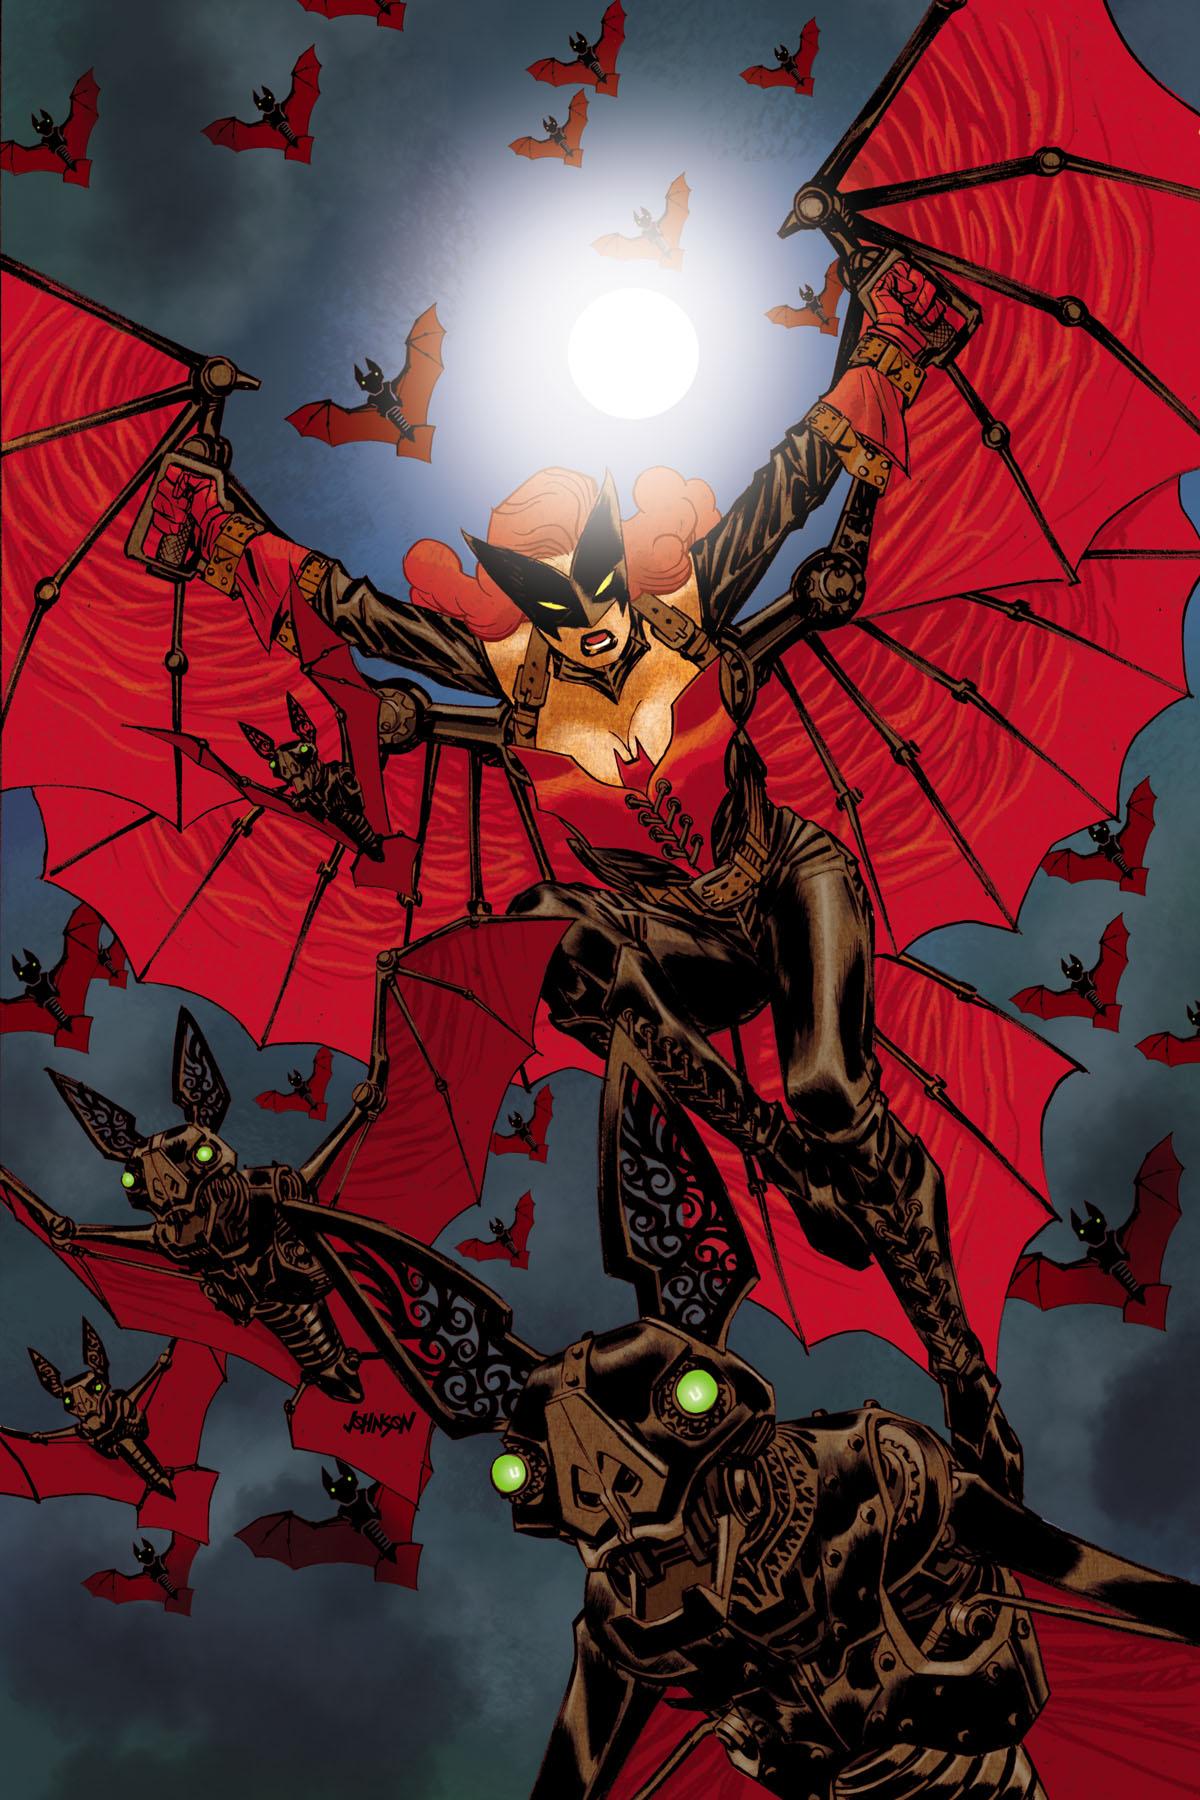 Batwoman New 52 Vol 2 File:batwoman Vol 2 28